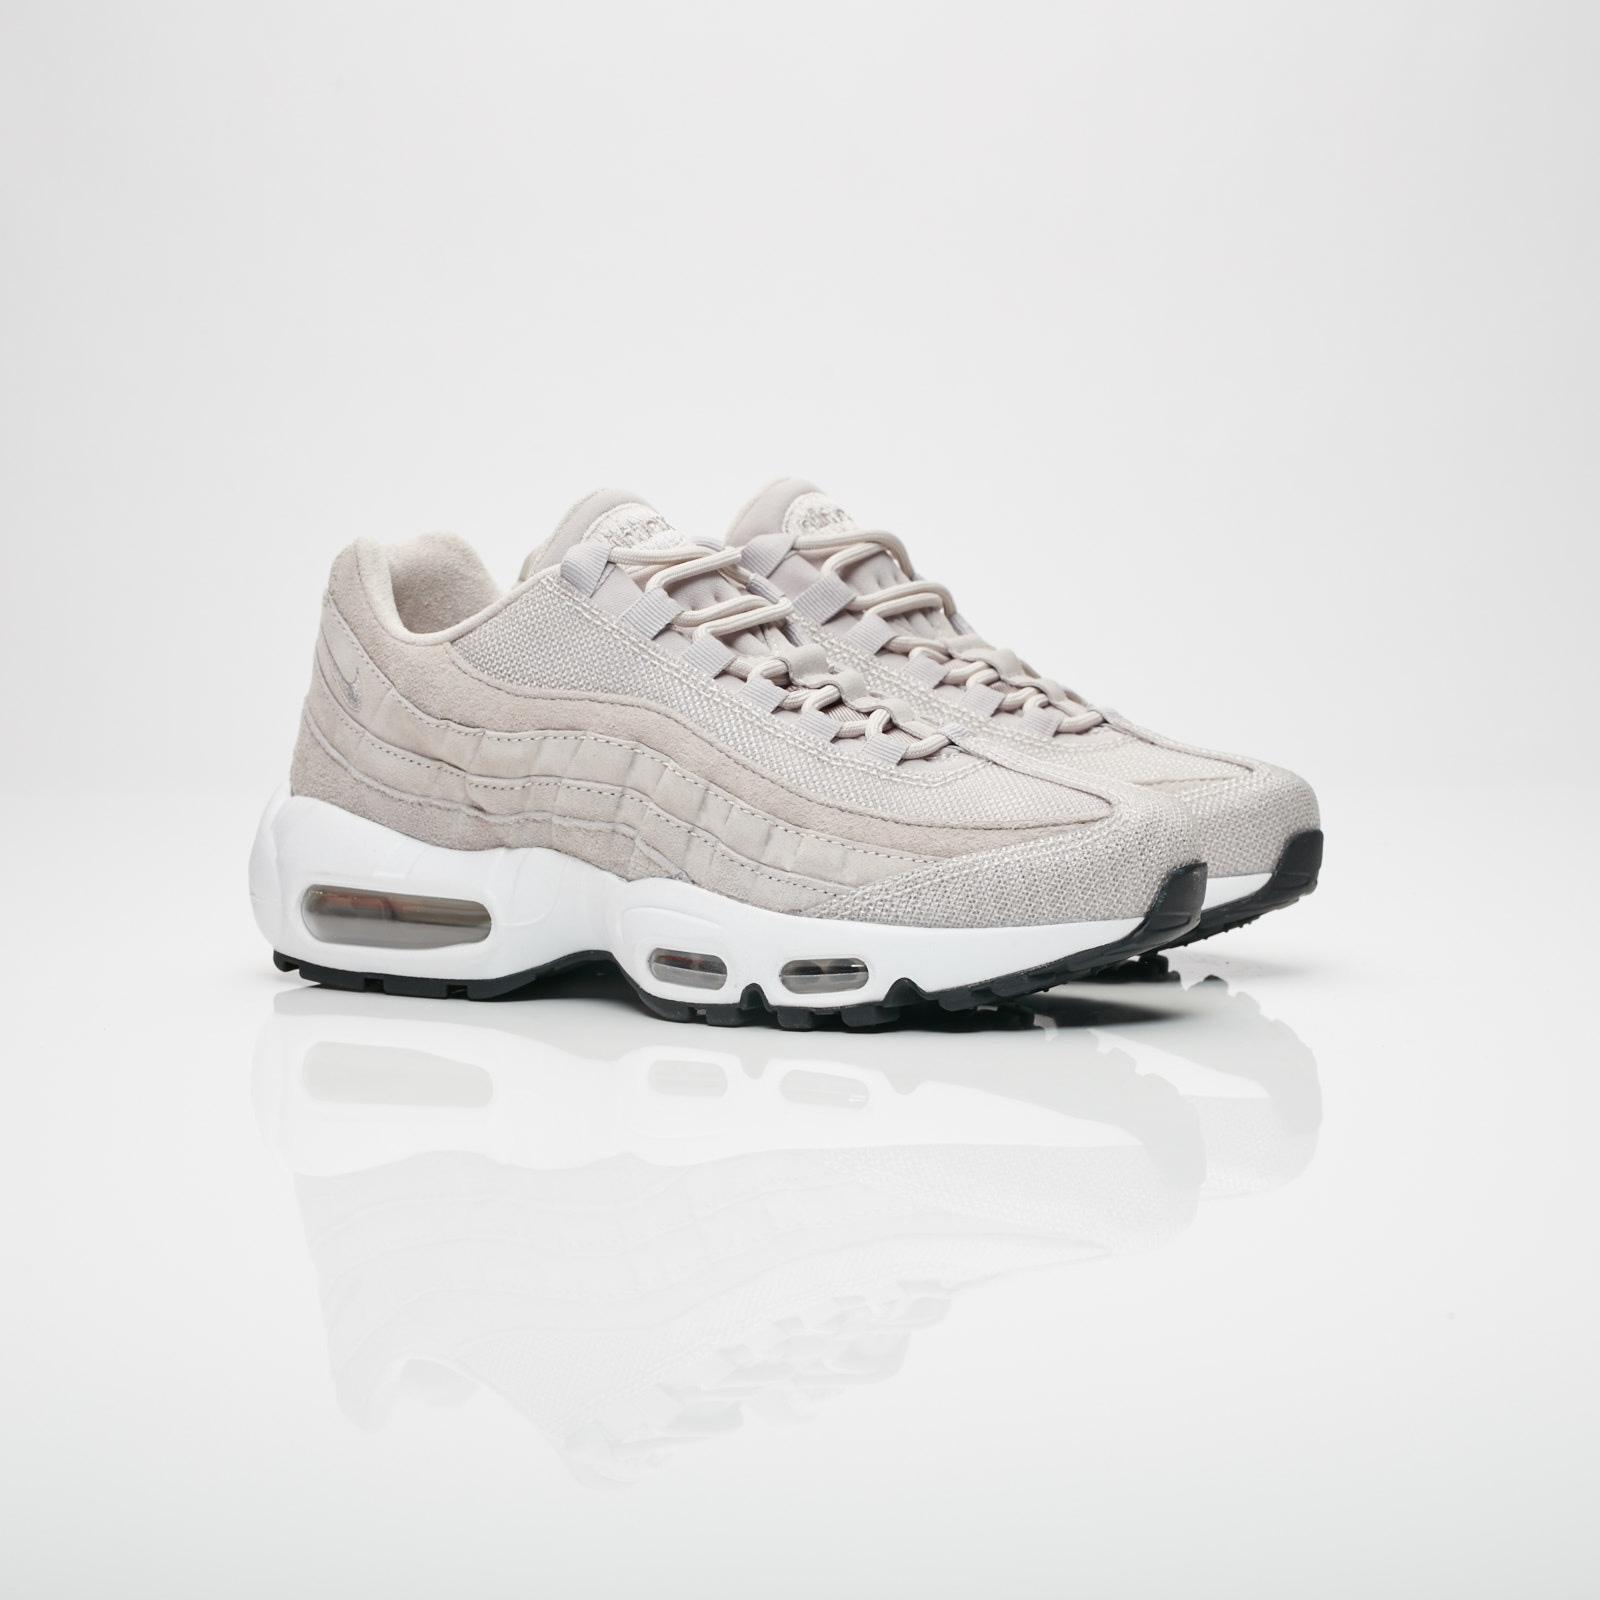 85bb80fb83 Nike Wmns Air Max 95 PRM - 807443-200 - Sneakersnstuff | sneakers ...